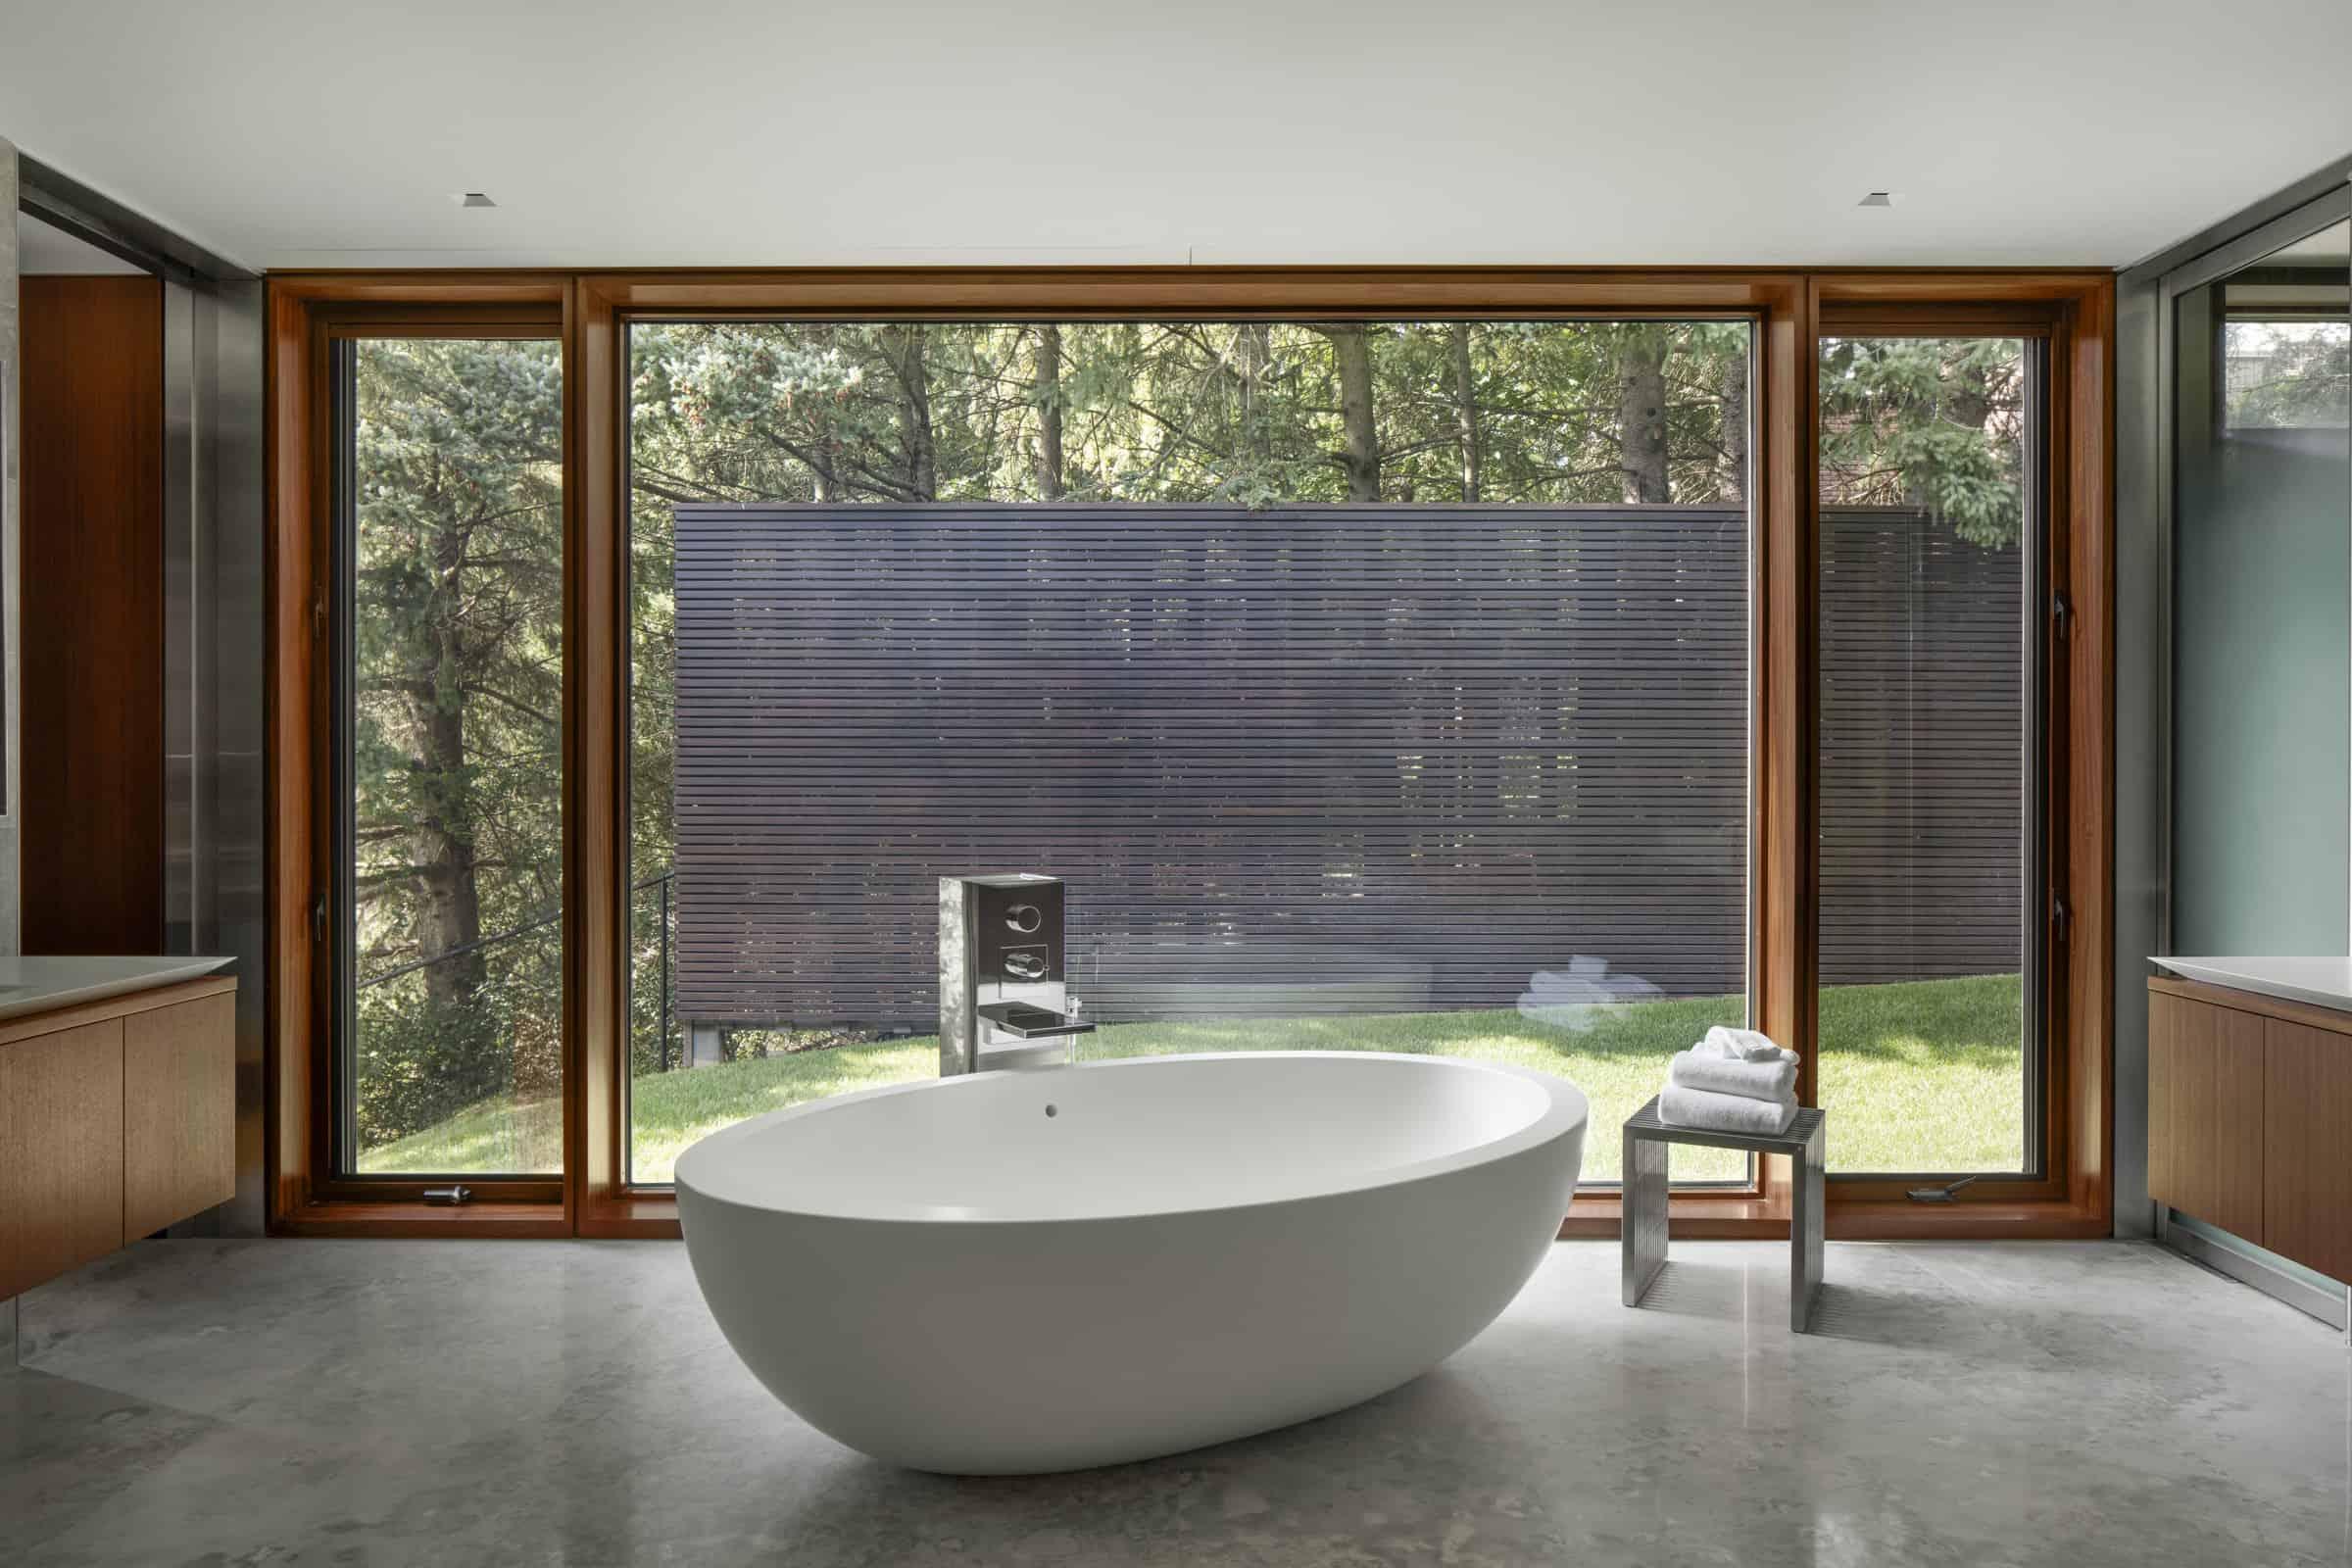 Studio Munge_Private Residence_28_Adrien Williams_web